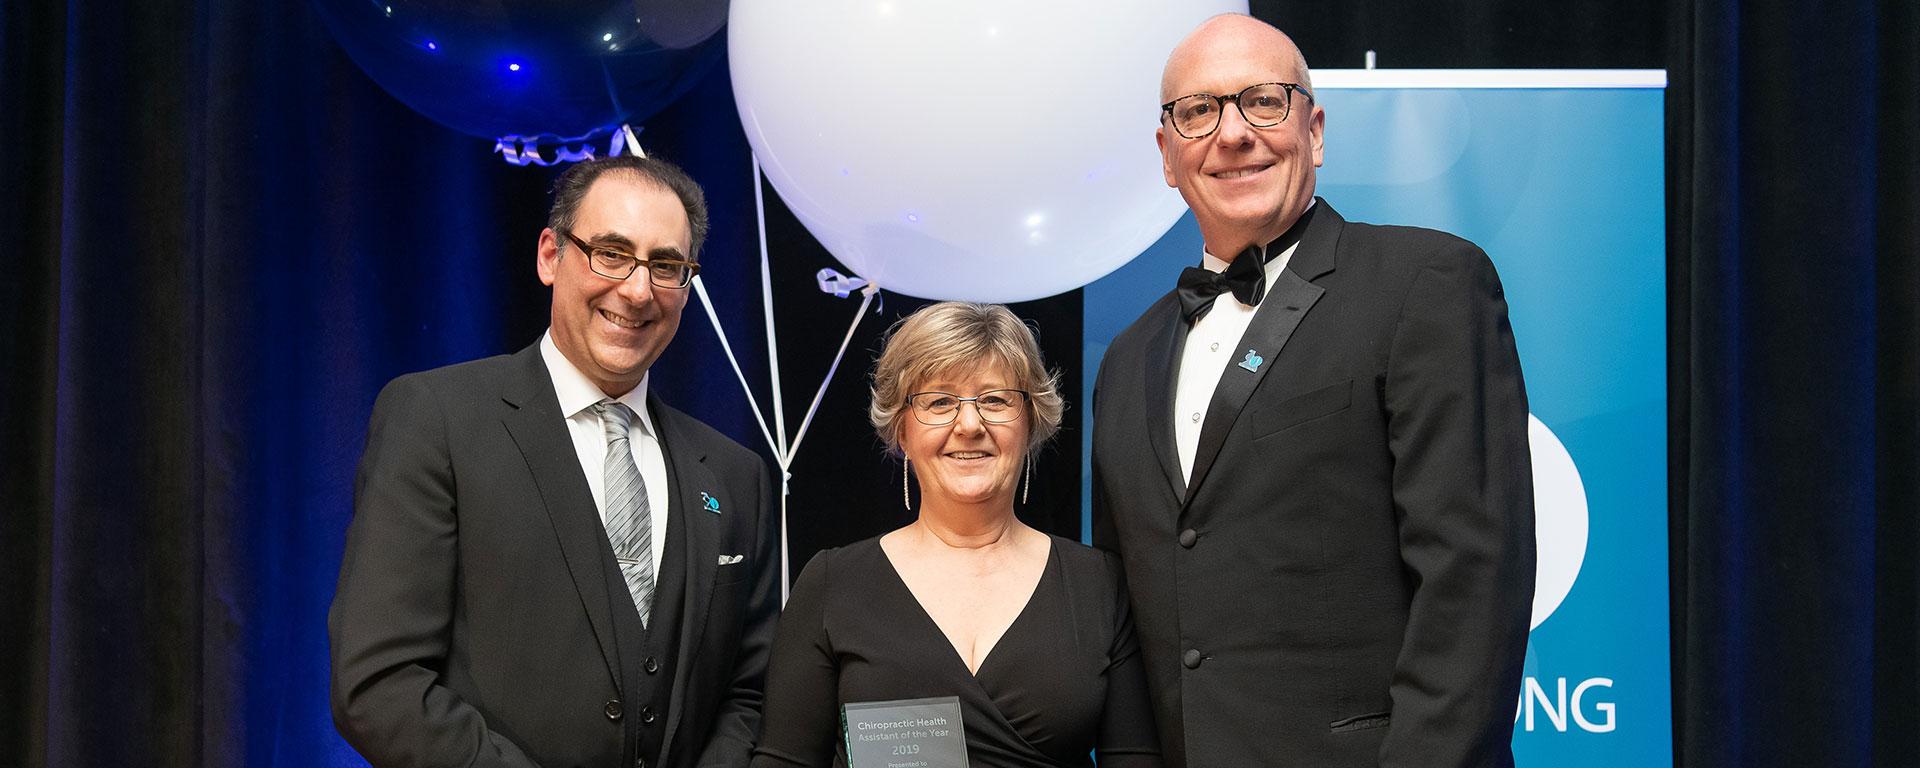 Debbie Kerr CHA of the Year Award Recipient